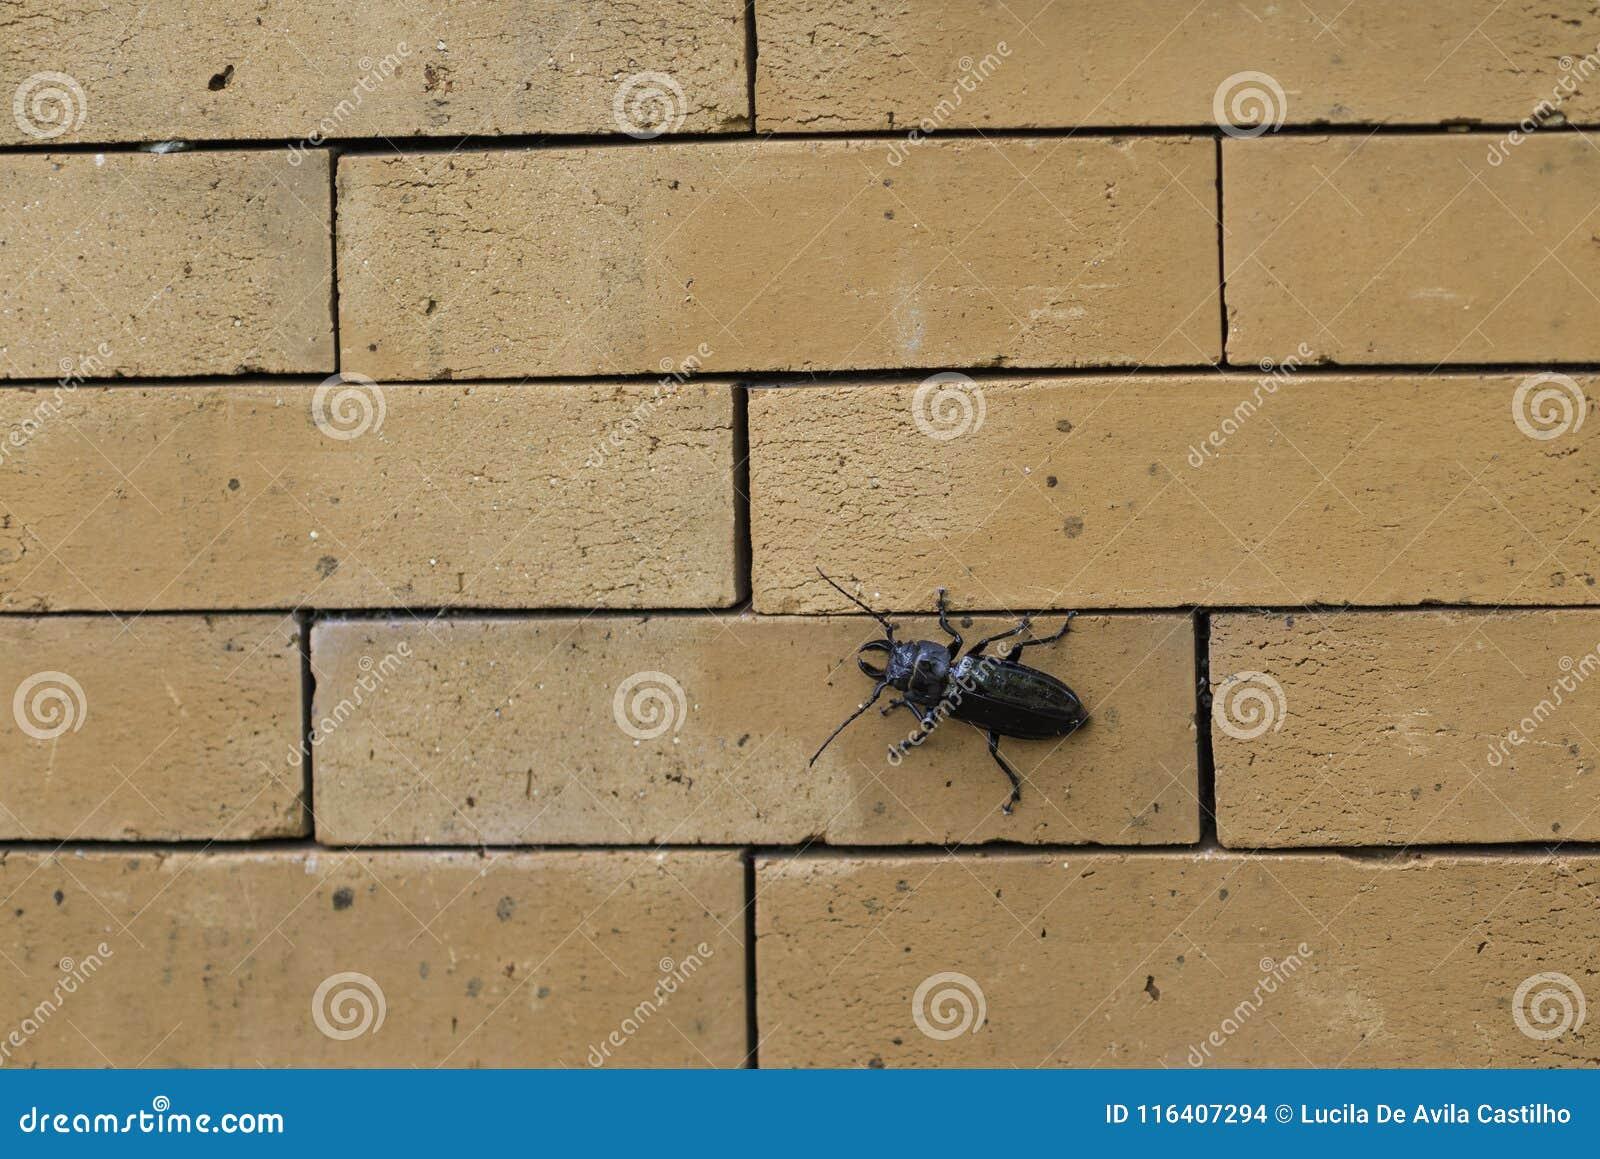 Mestkever calmly schalen de bakstenen muur